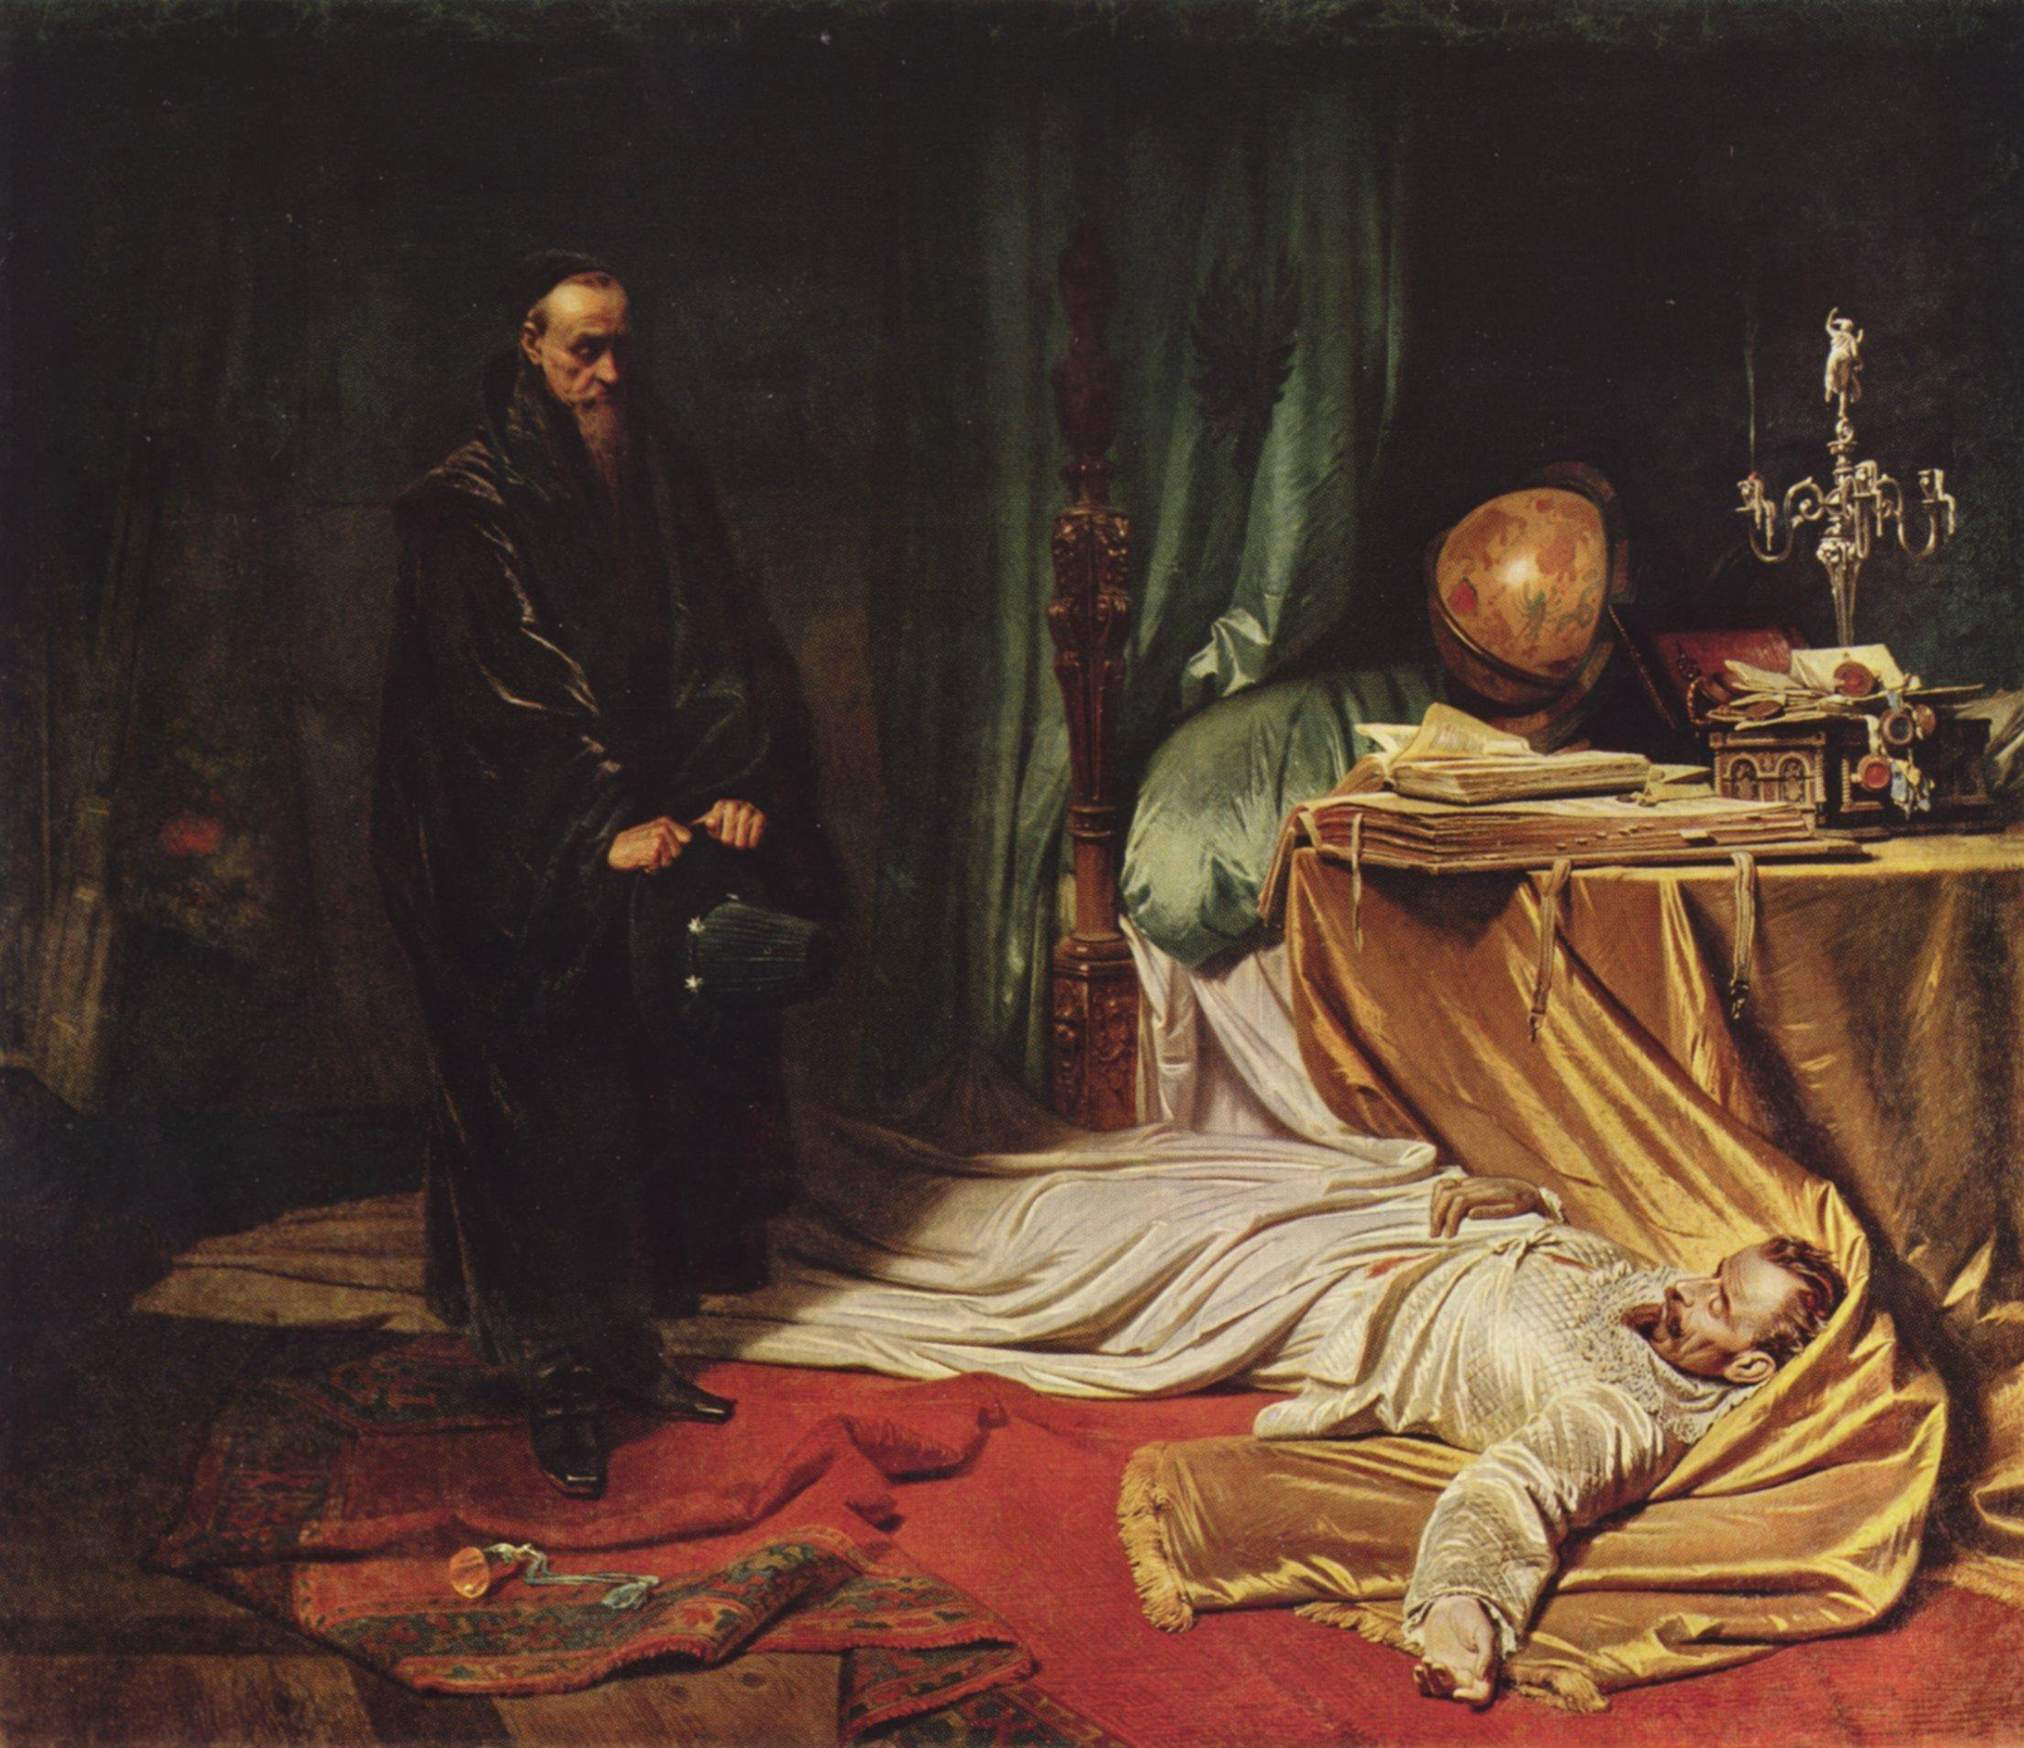 A belated visit an astrologer. Charles Pilots, 1855.